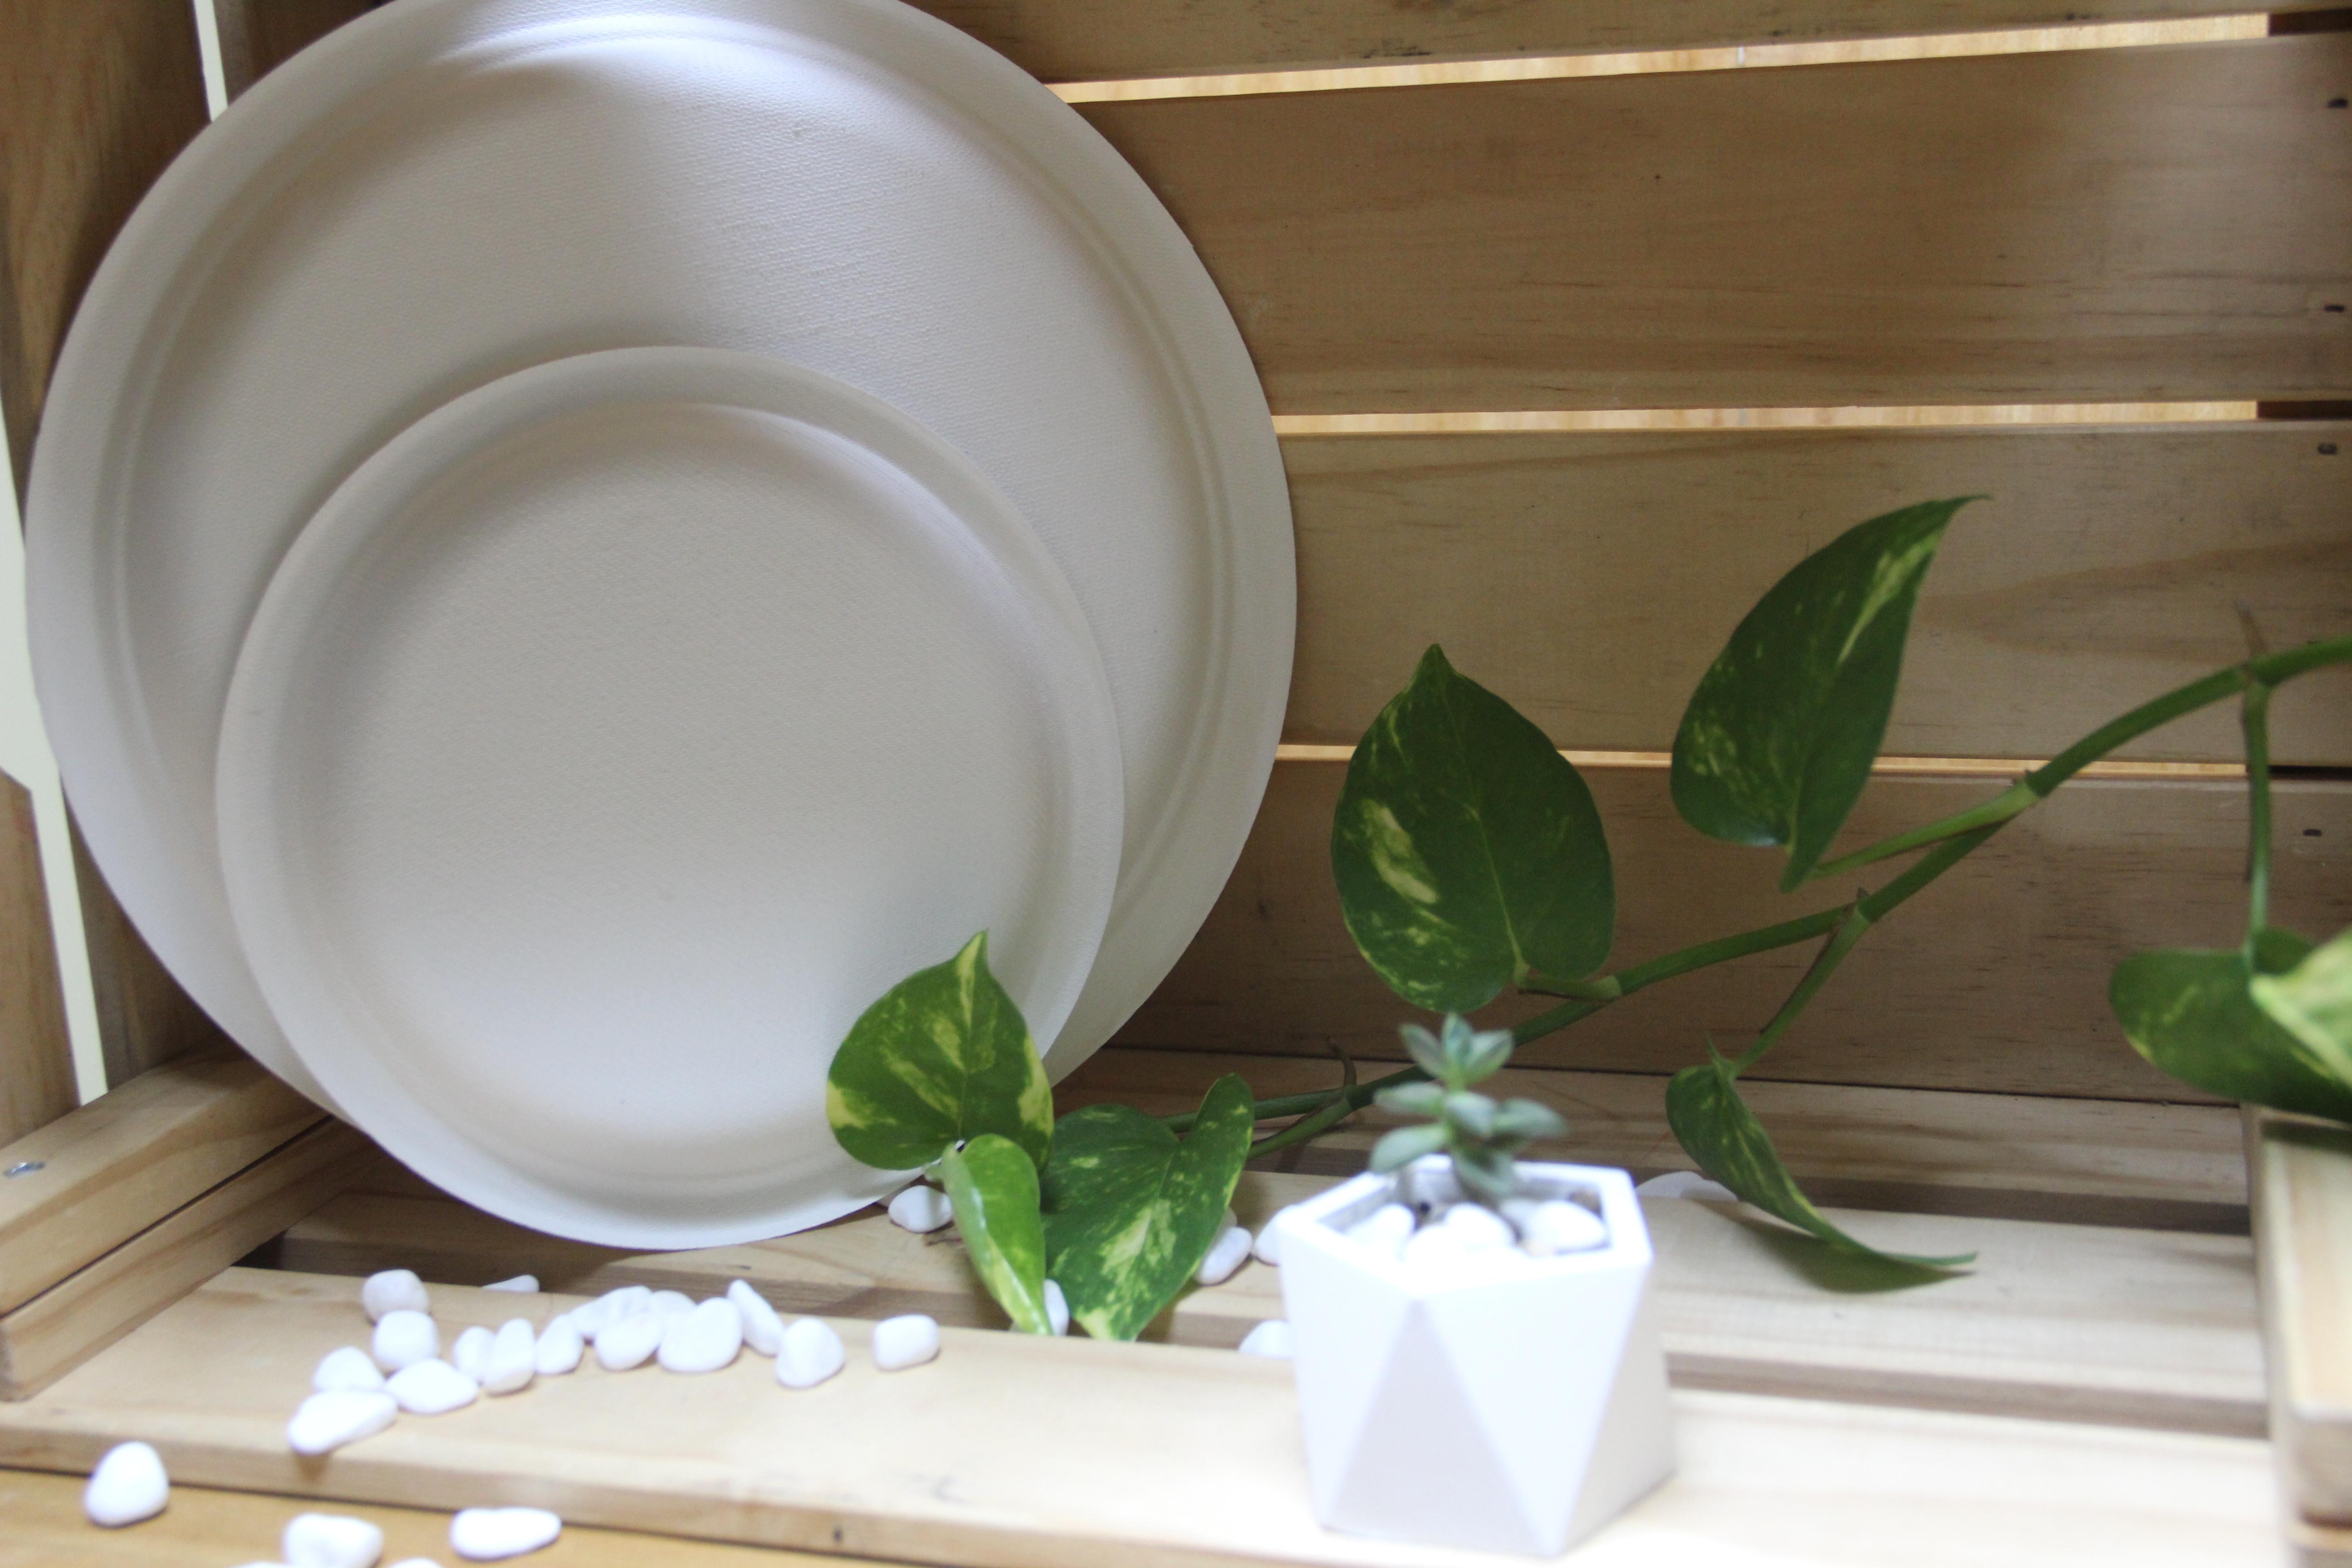 Plato redondo compostable